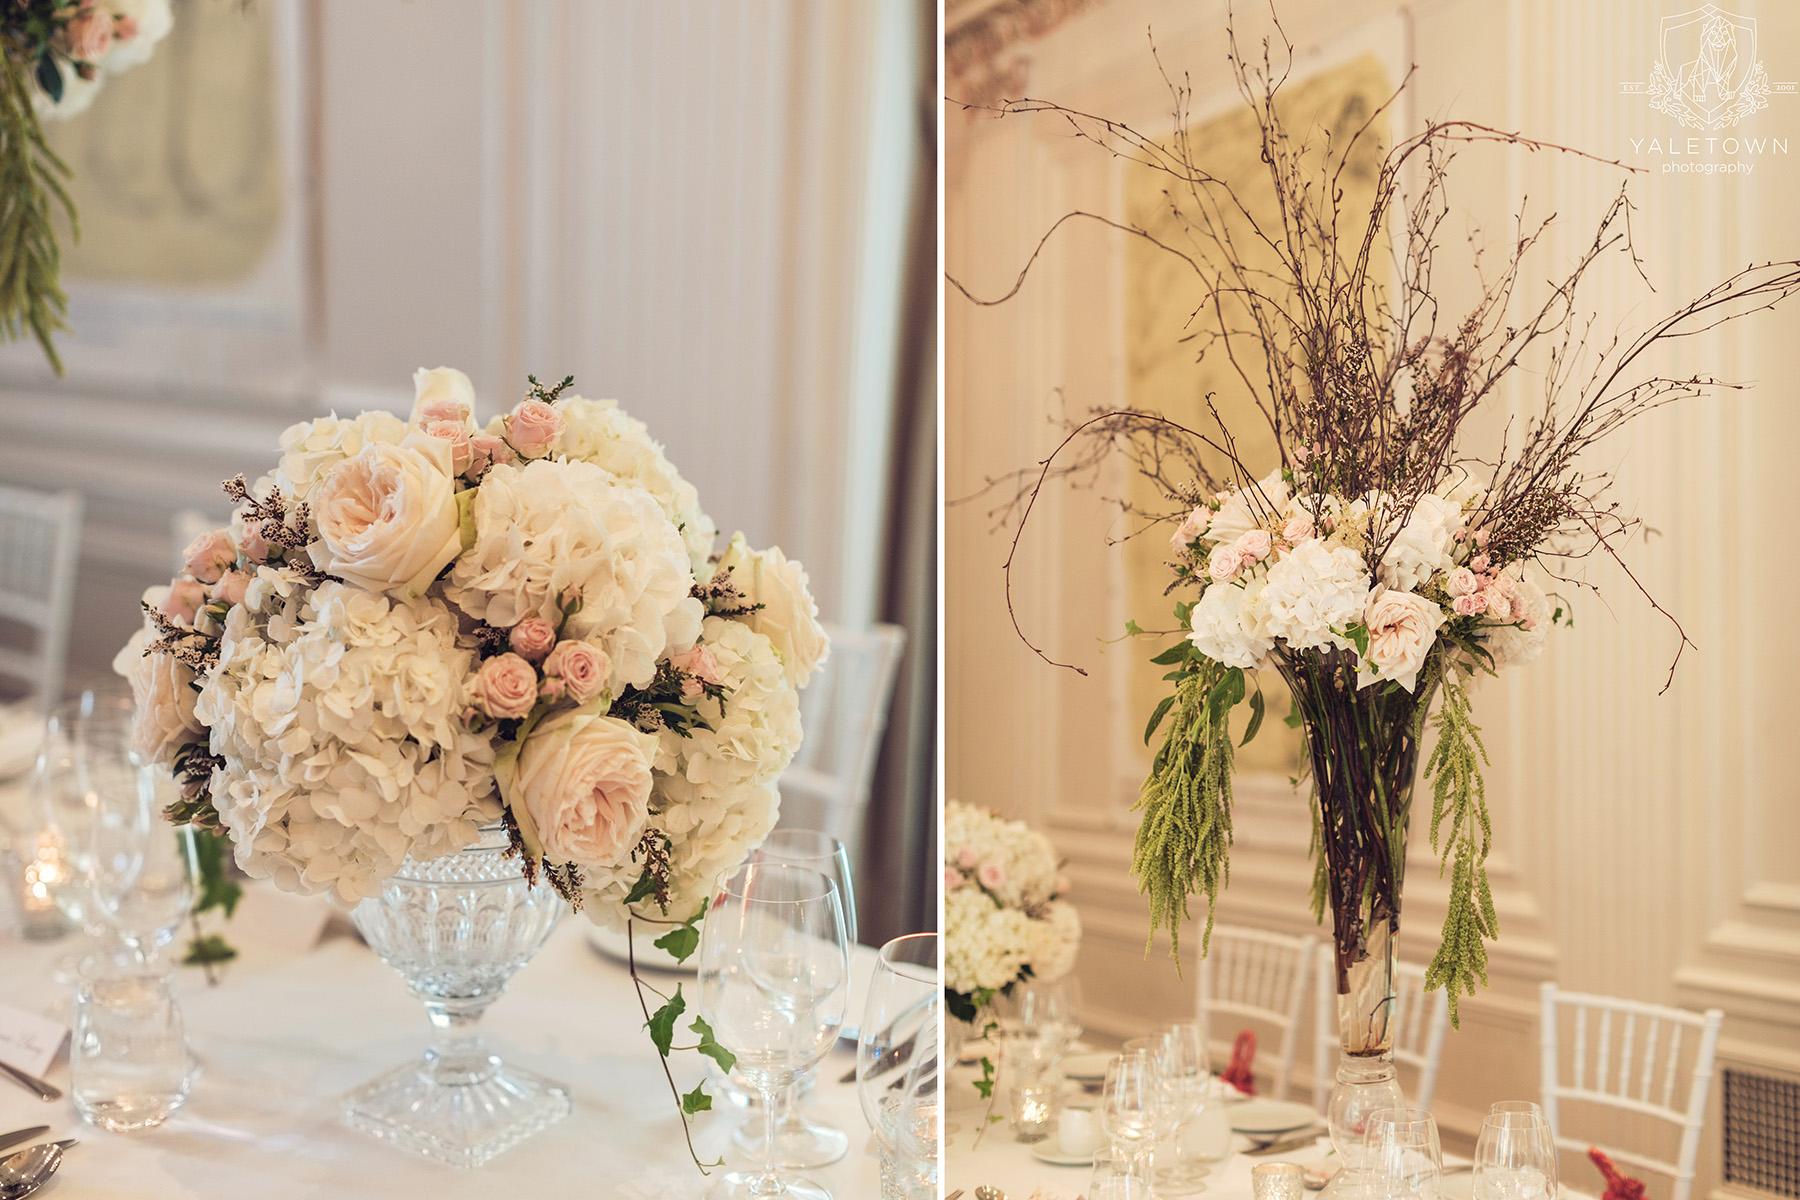 Wedding-Reception-Details-Floral-Arrangements-Rosewood-Hotel-Georgia-Vancouver-Wedding-Yaletown-Photography-photo